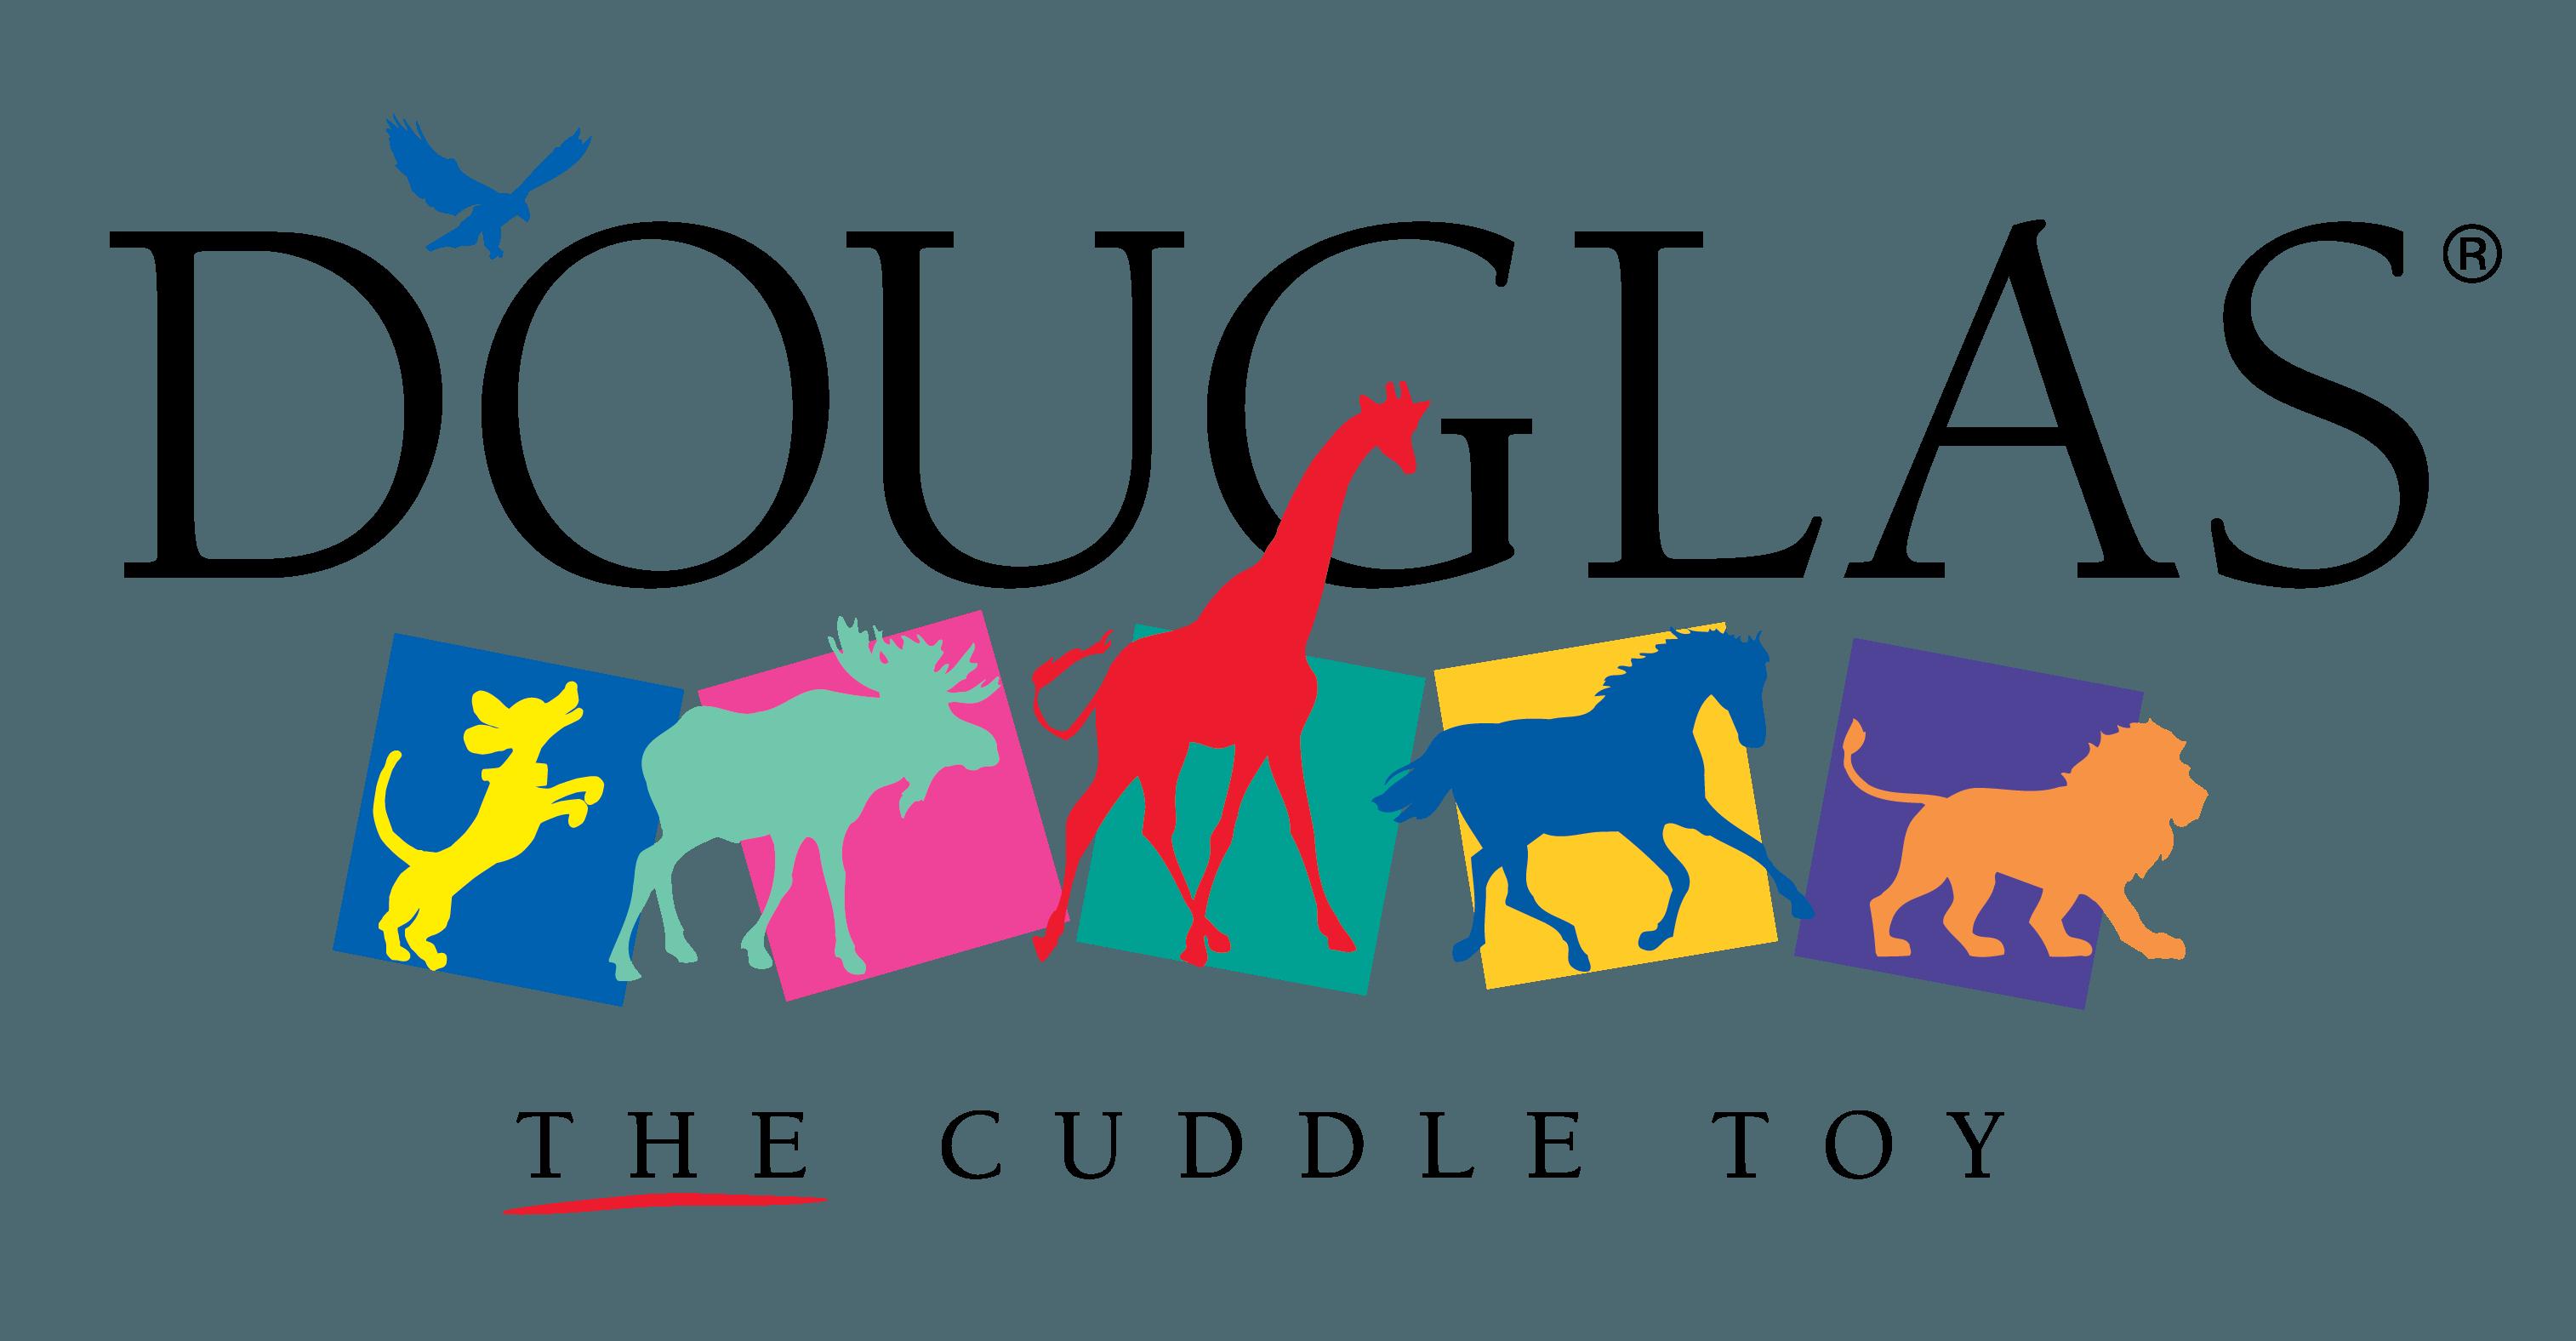 Douglas Cuddle Toy logo